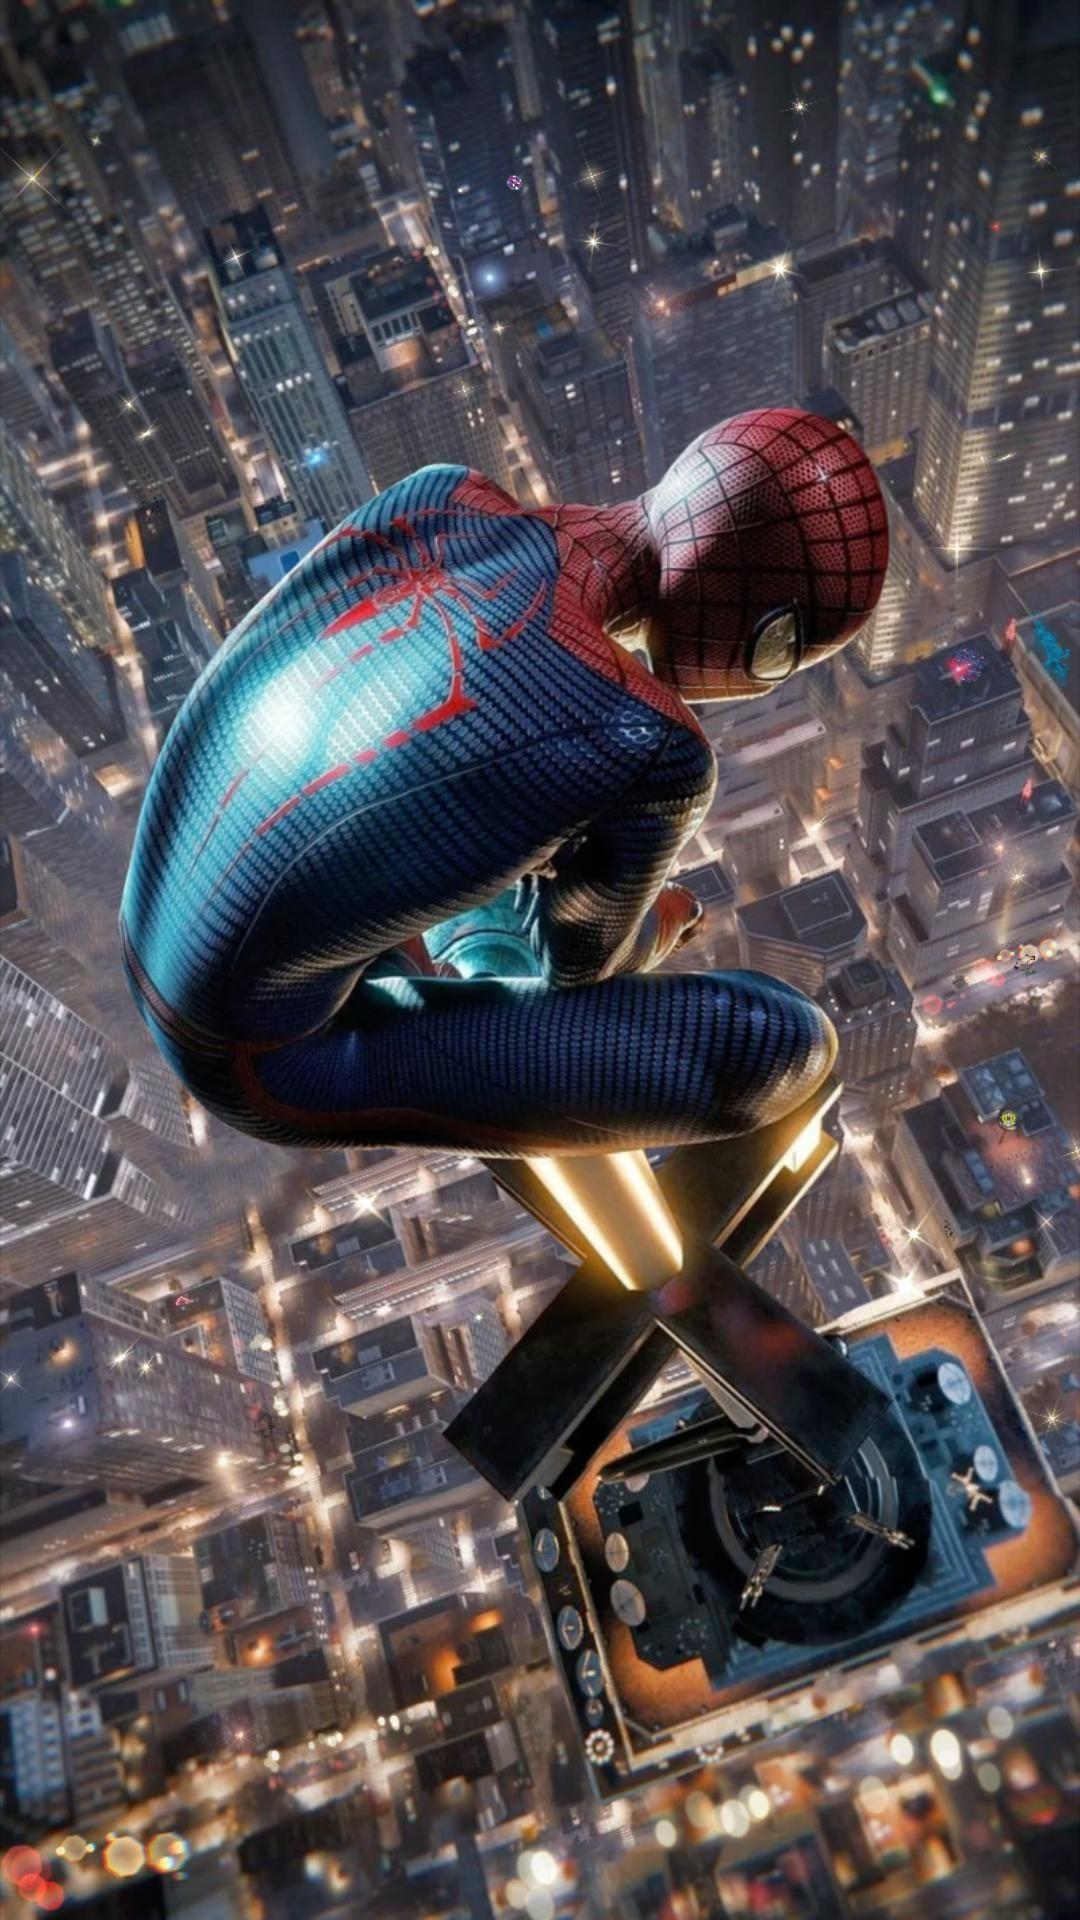 Spider-Man animated with @werbleapp #spiderman